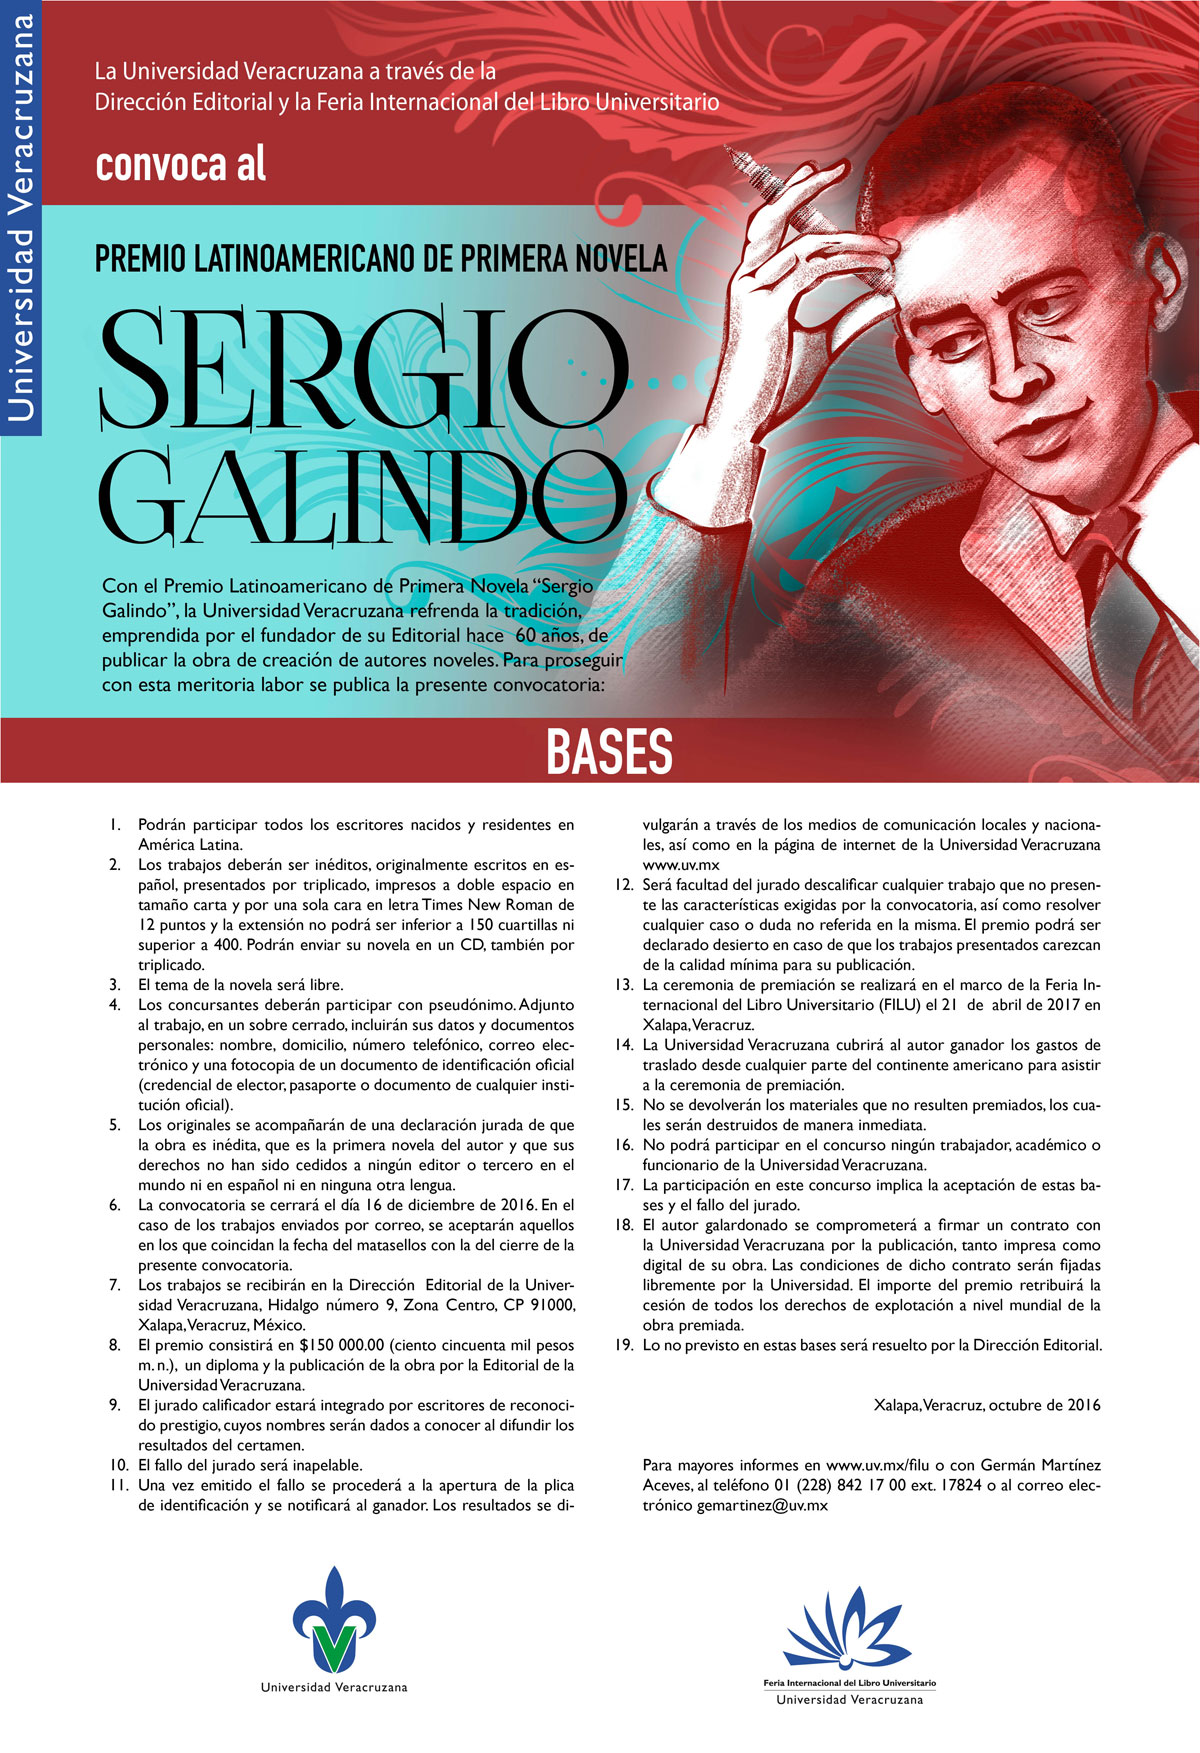 convocatoria-sergio-galindo-2016-op